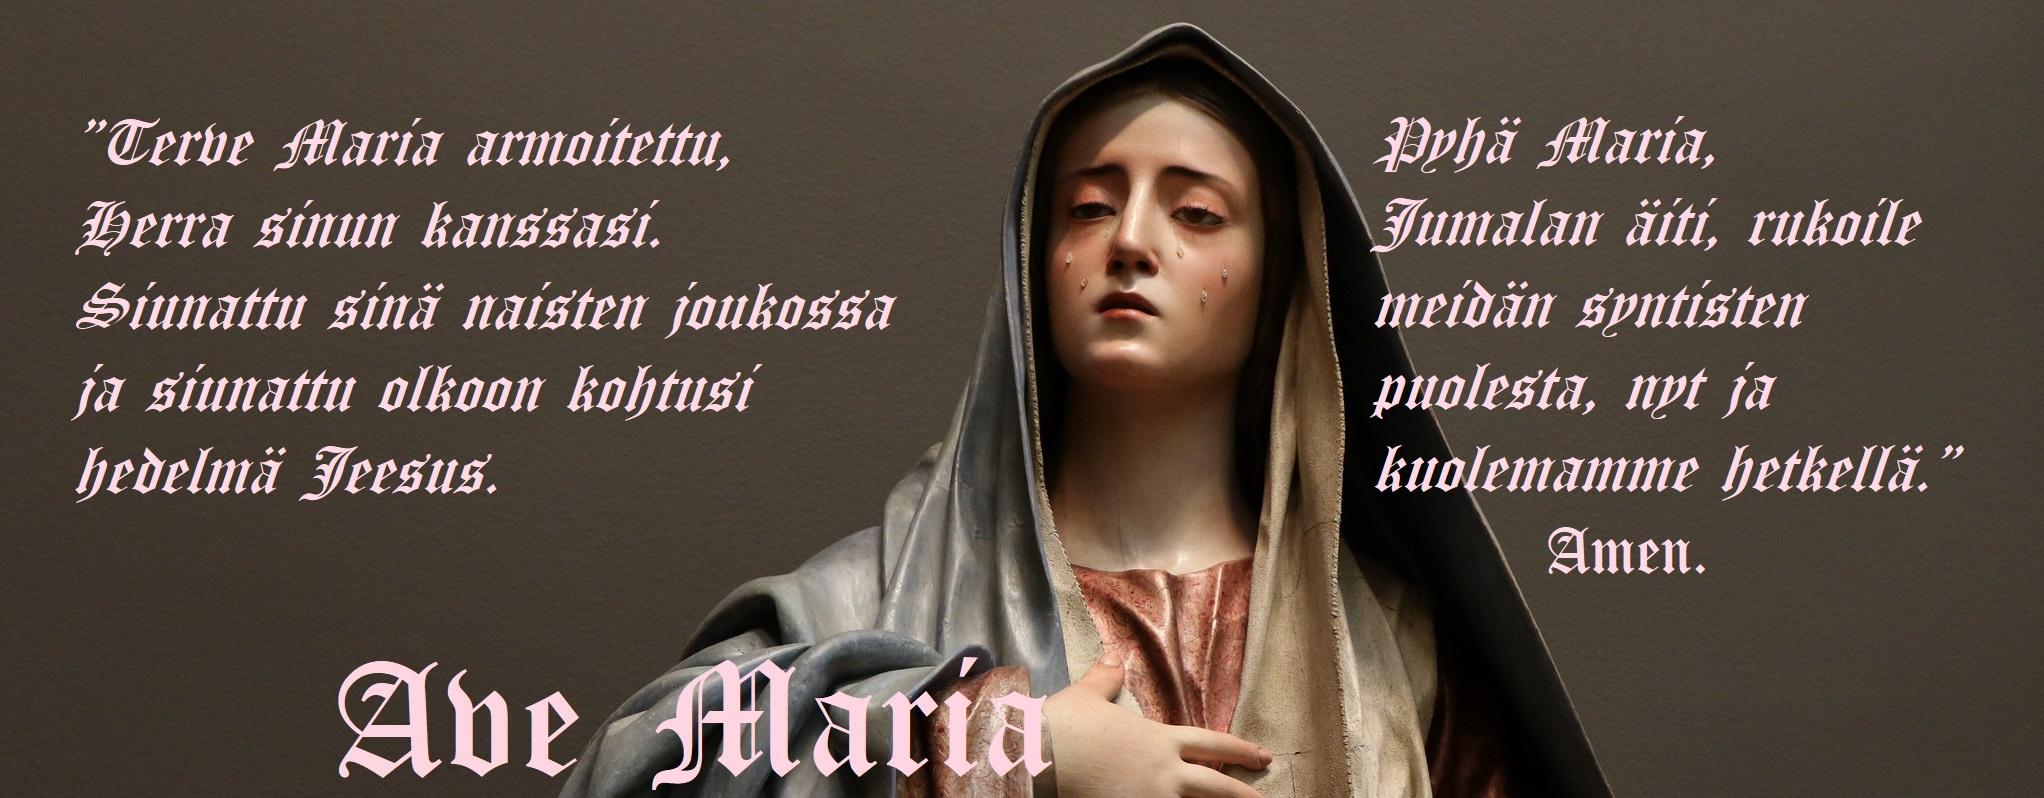 Ave Maria Suomeksi